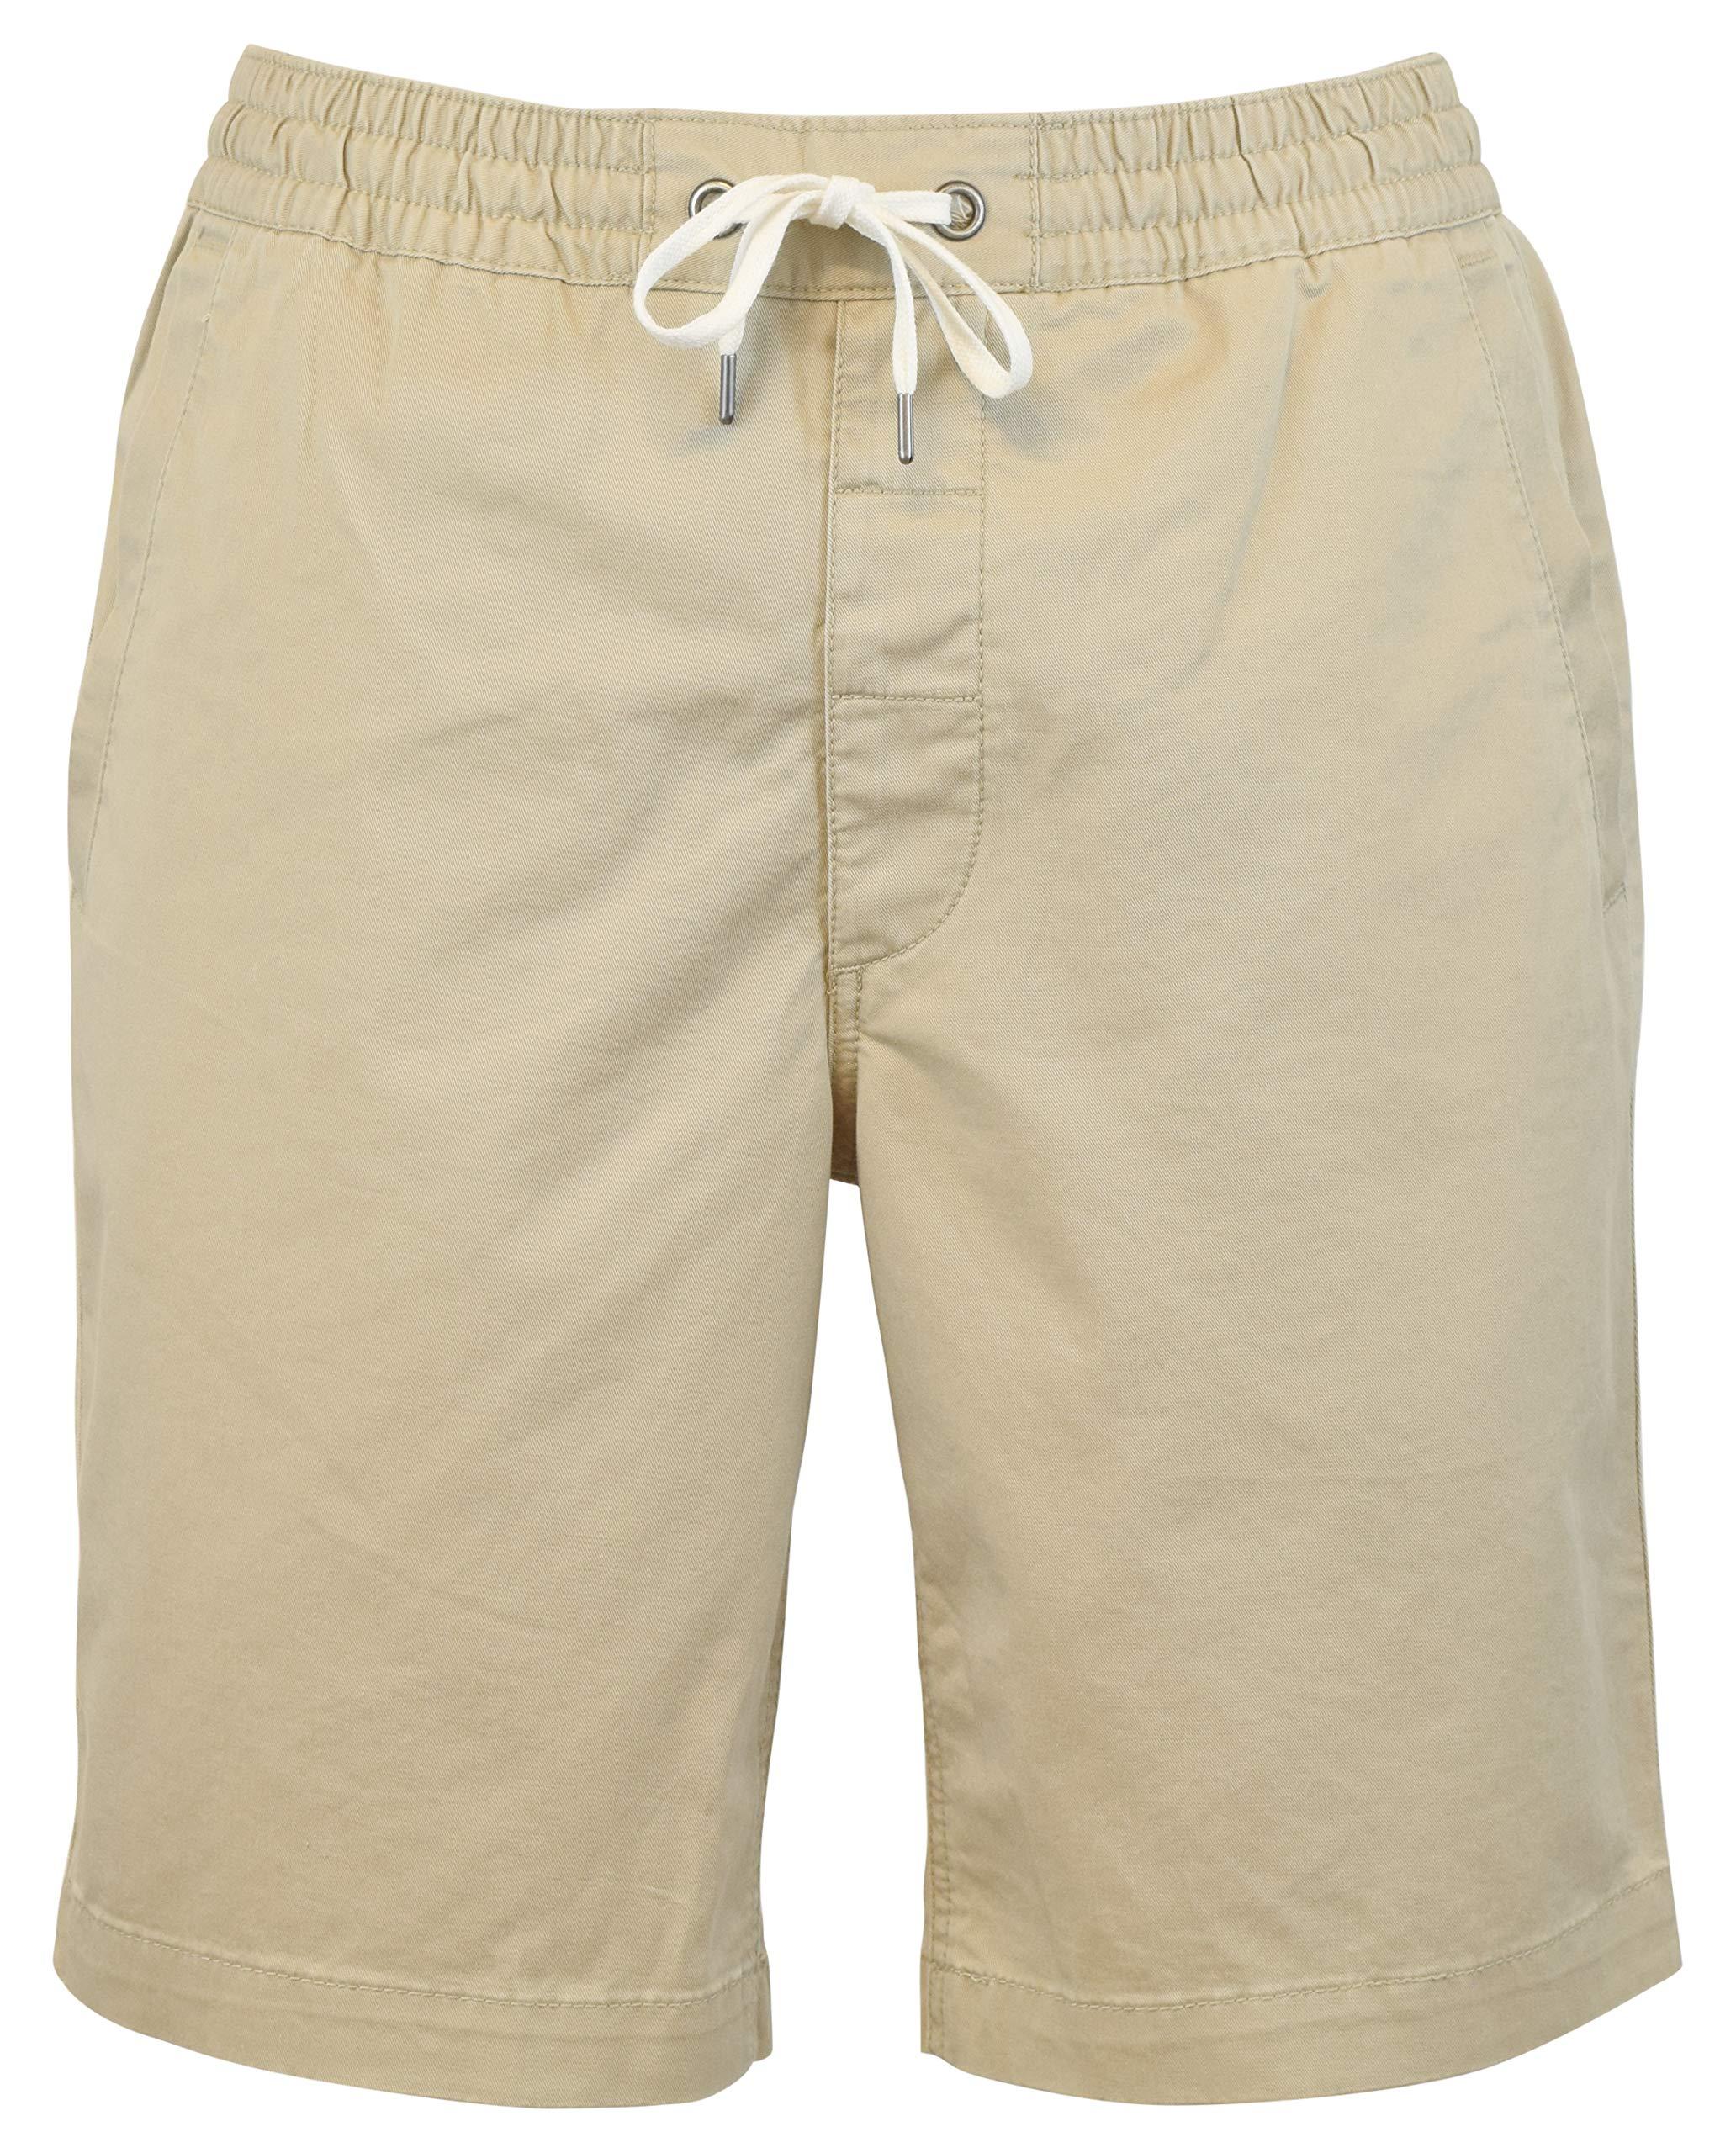 Polo Ralph Lauren Mens Classic Fit 9'' Drawstring Shorts, Beige, Medium